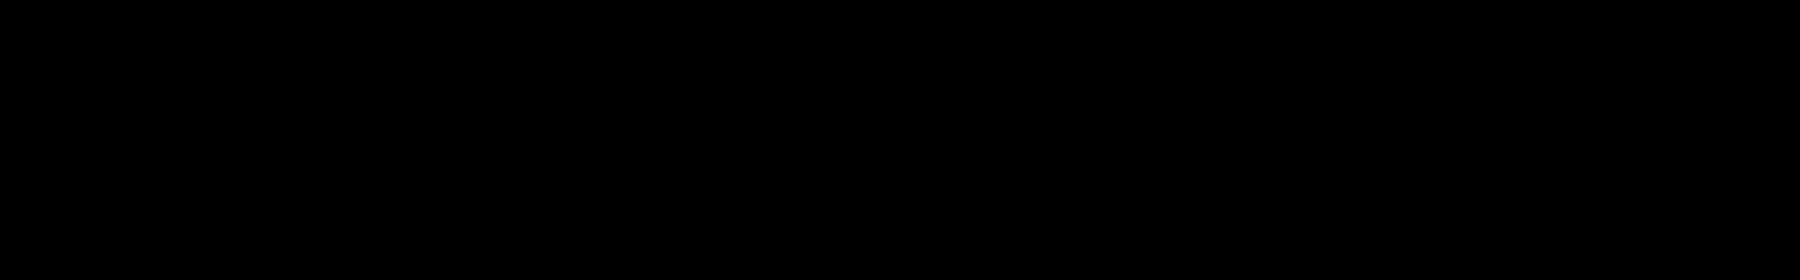 Solar audio waveform